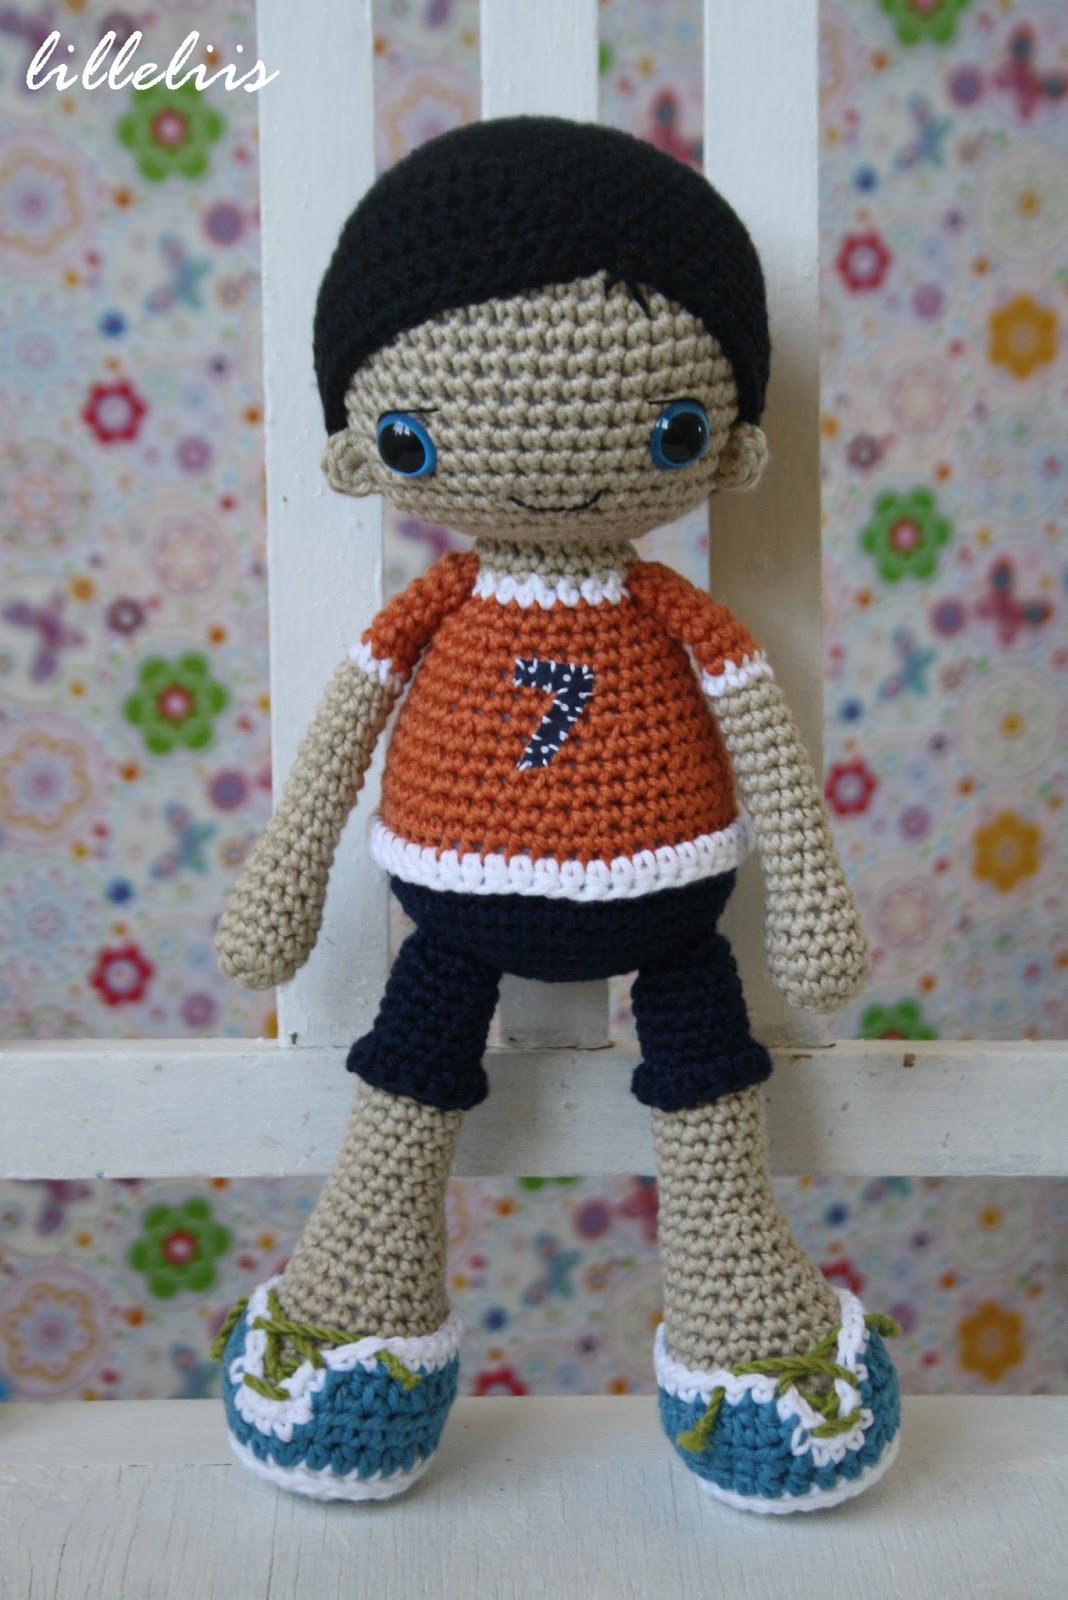 Free Amigurumi Boy Doll Patterns : lilleliis.blogspot.com: Heegeldatud poiss-nukk/Amigurumi ...